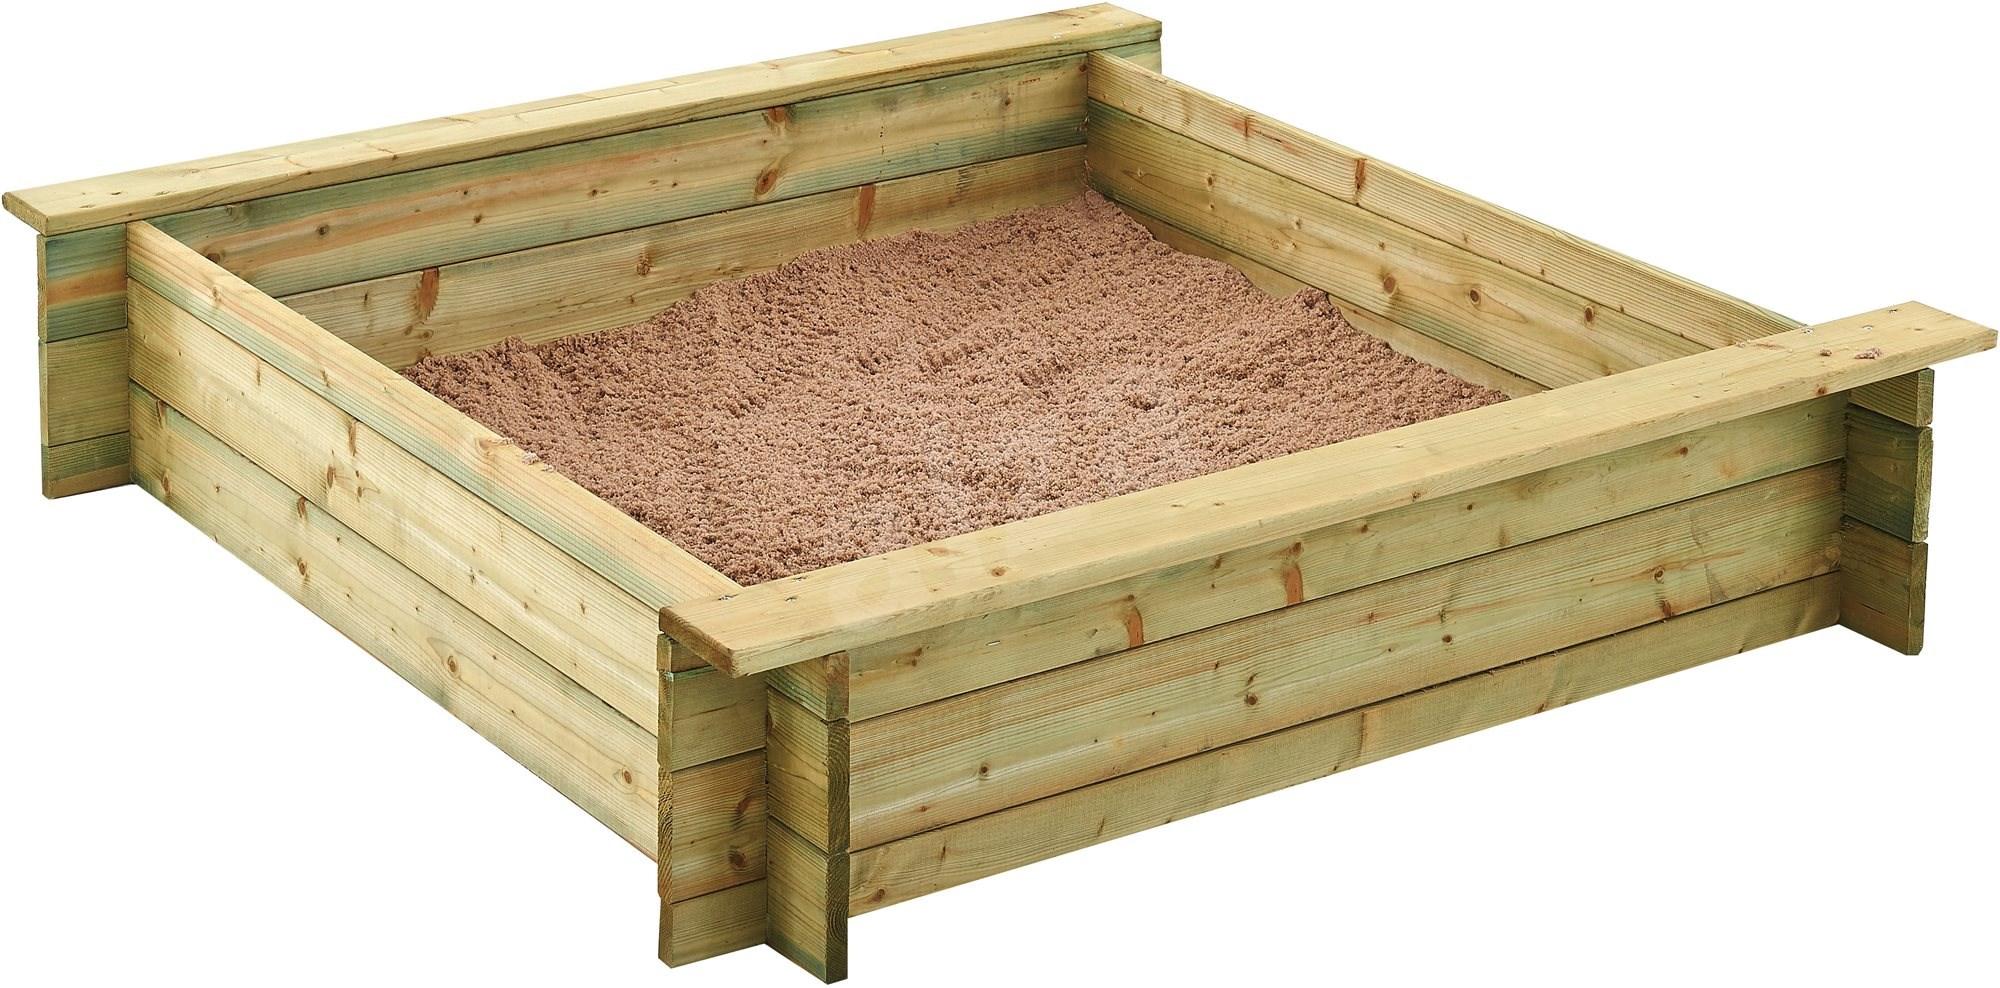 holz sandkasten trigano alix 120 cm sandkasten. Black Bedroom Furniture Sets. Home Design Ideas